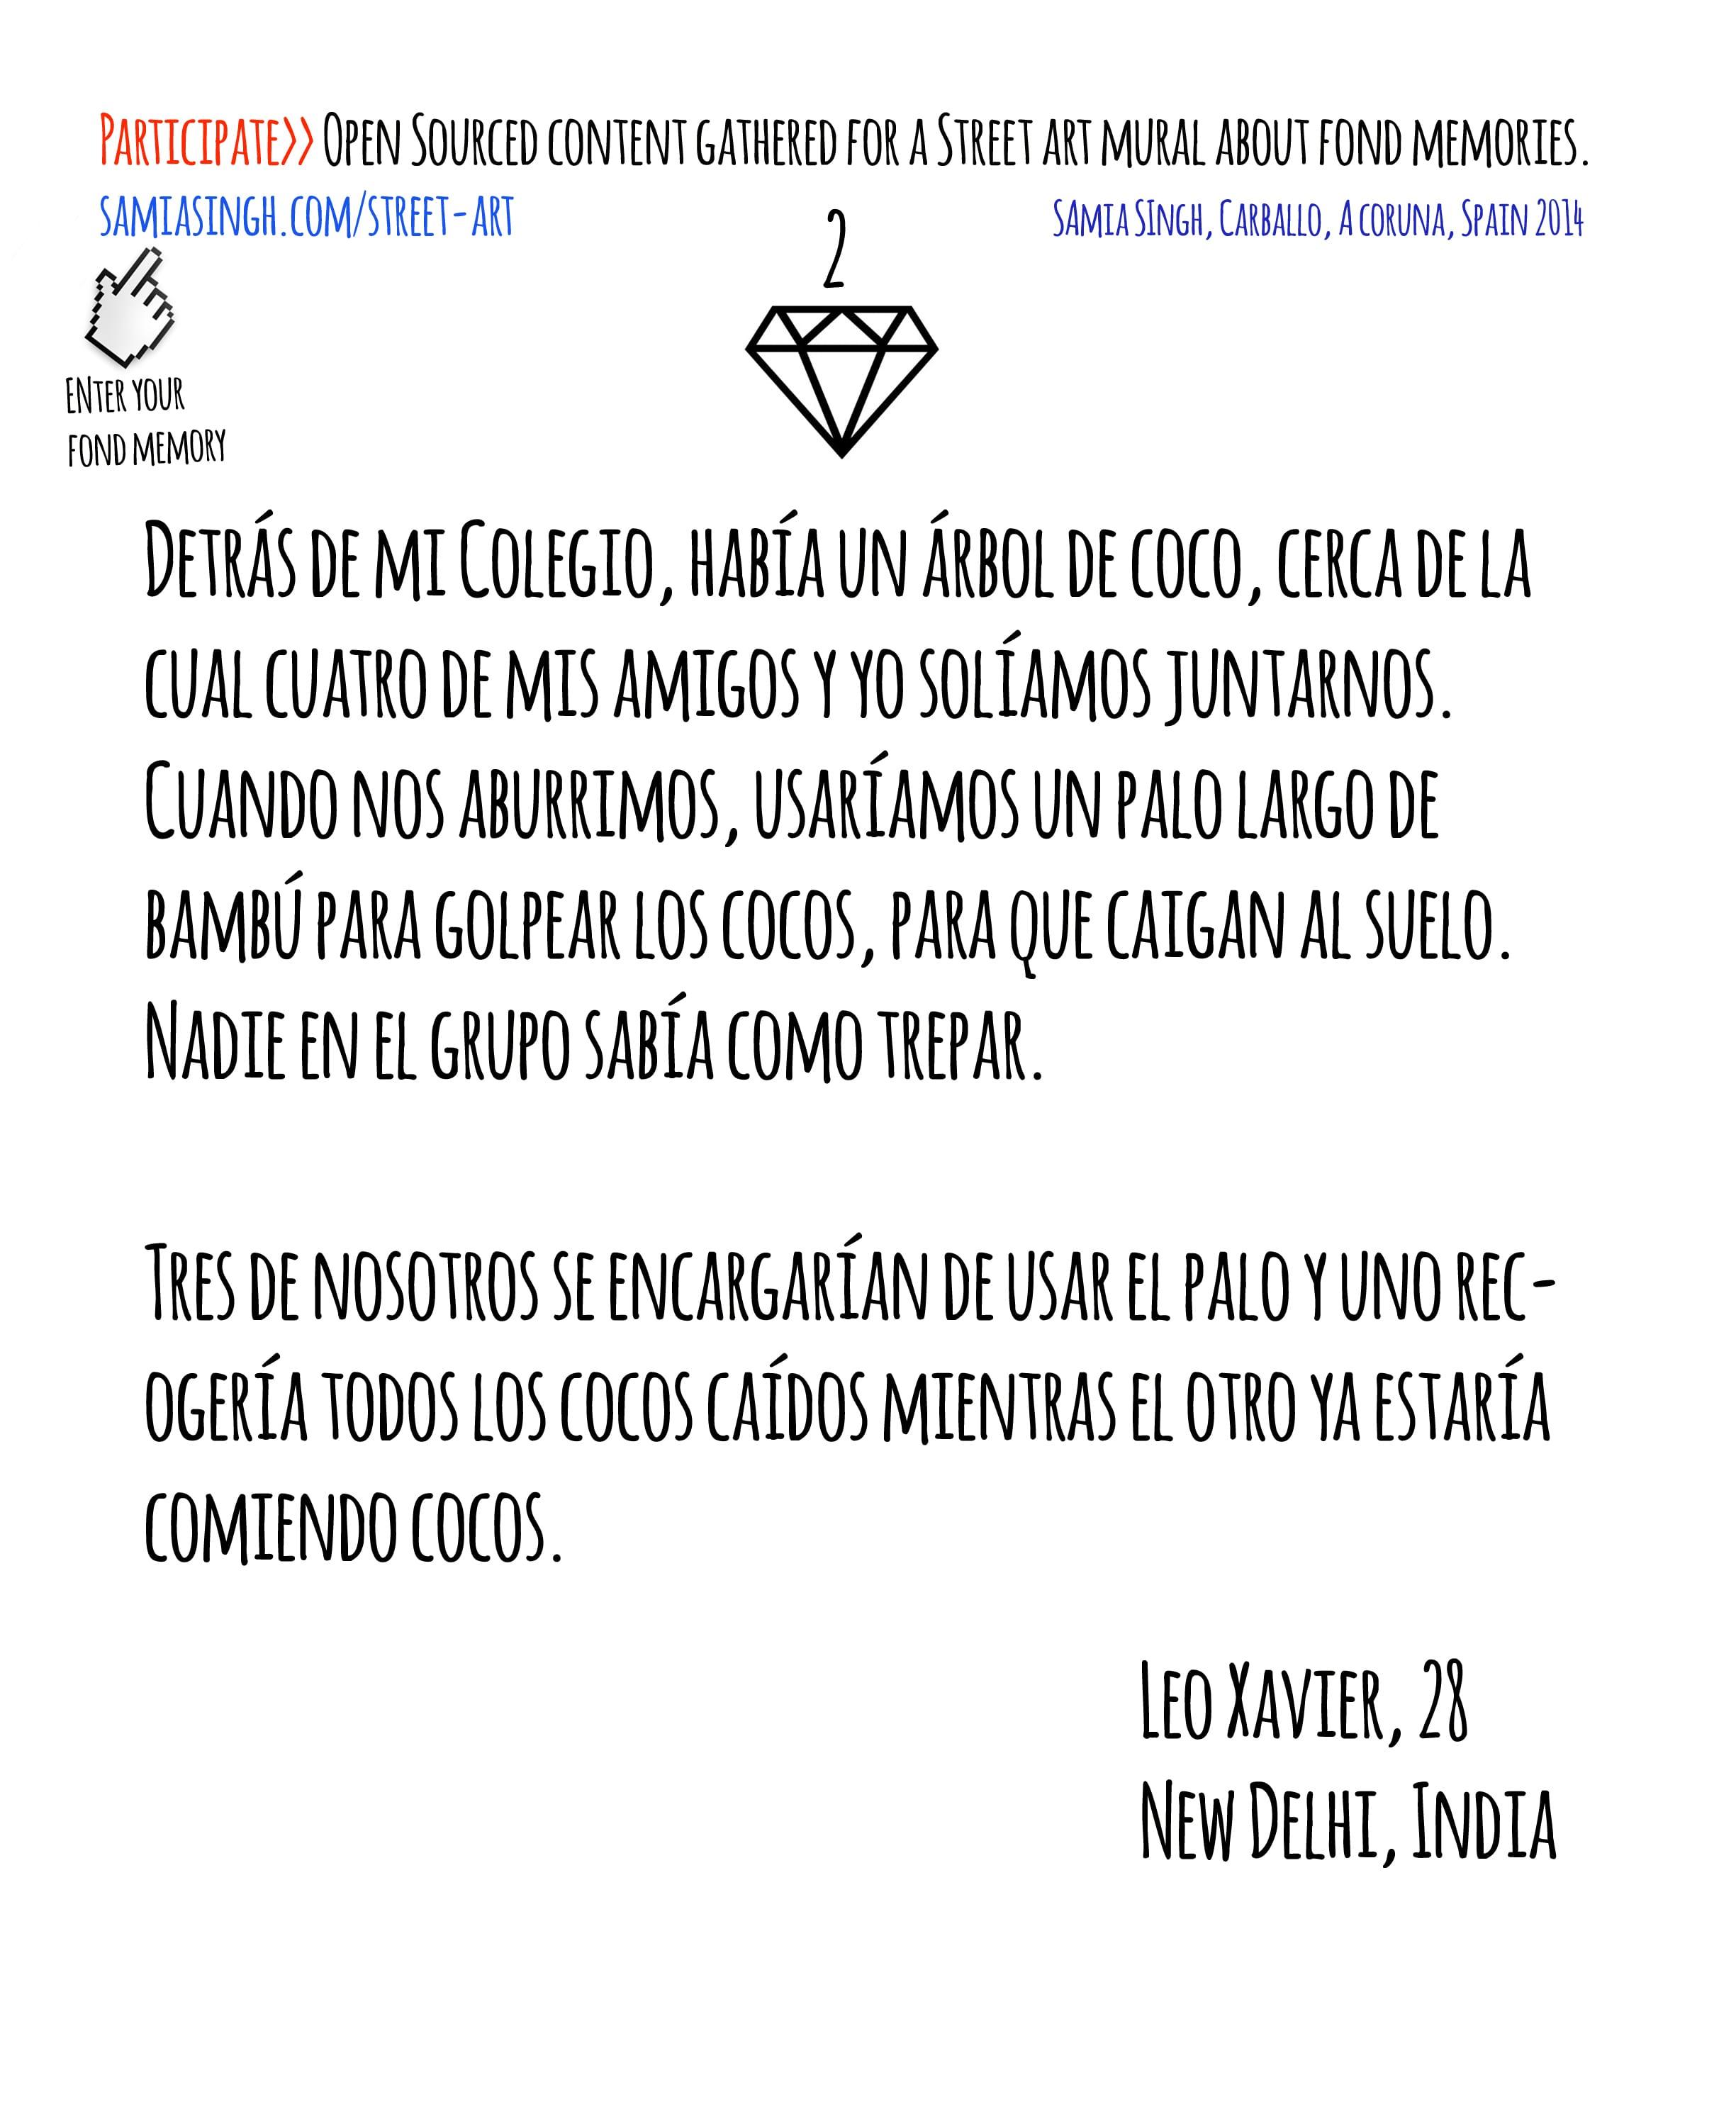 2_FondMemory_Espaniol